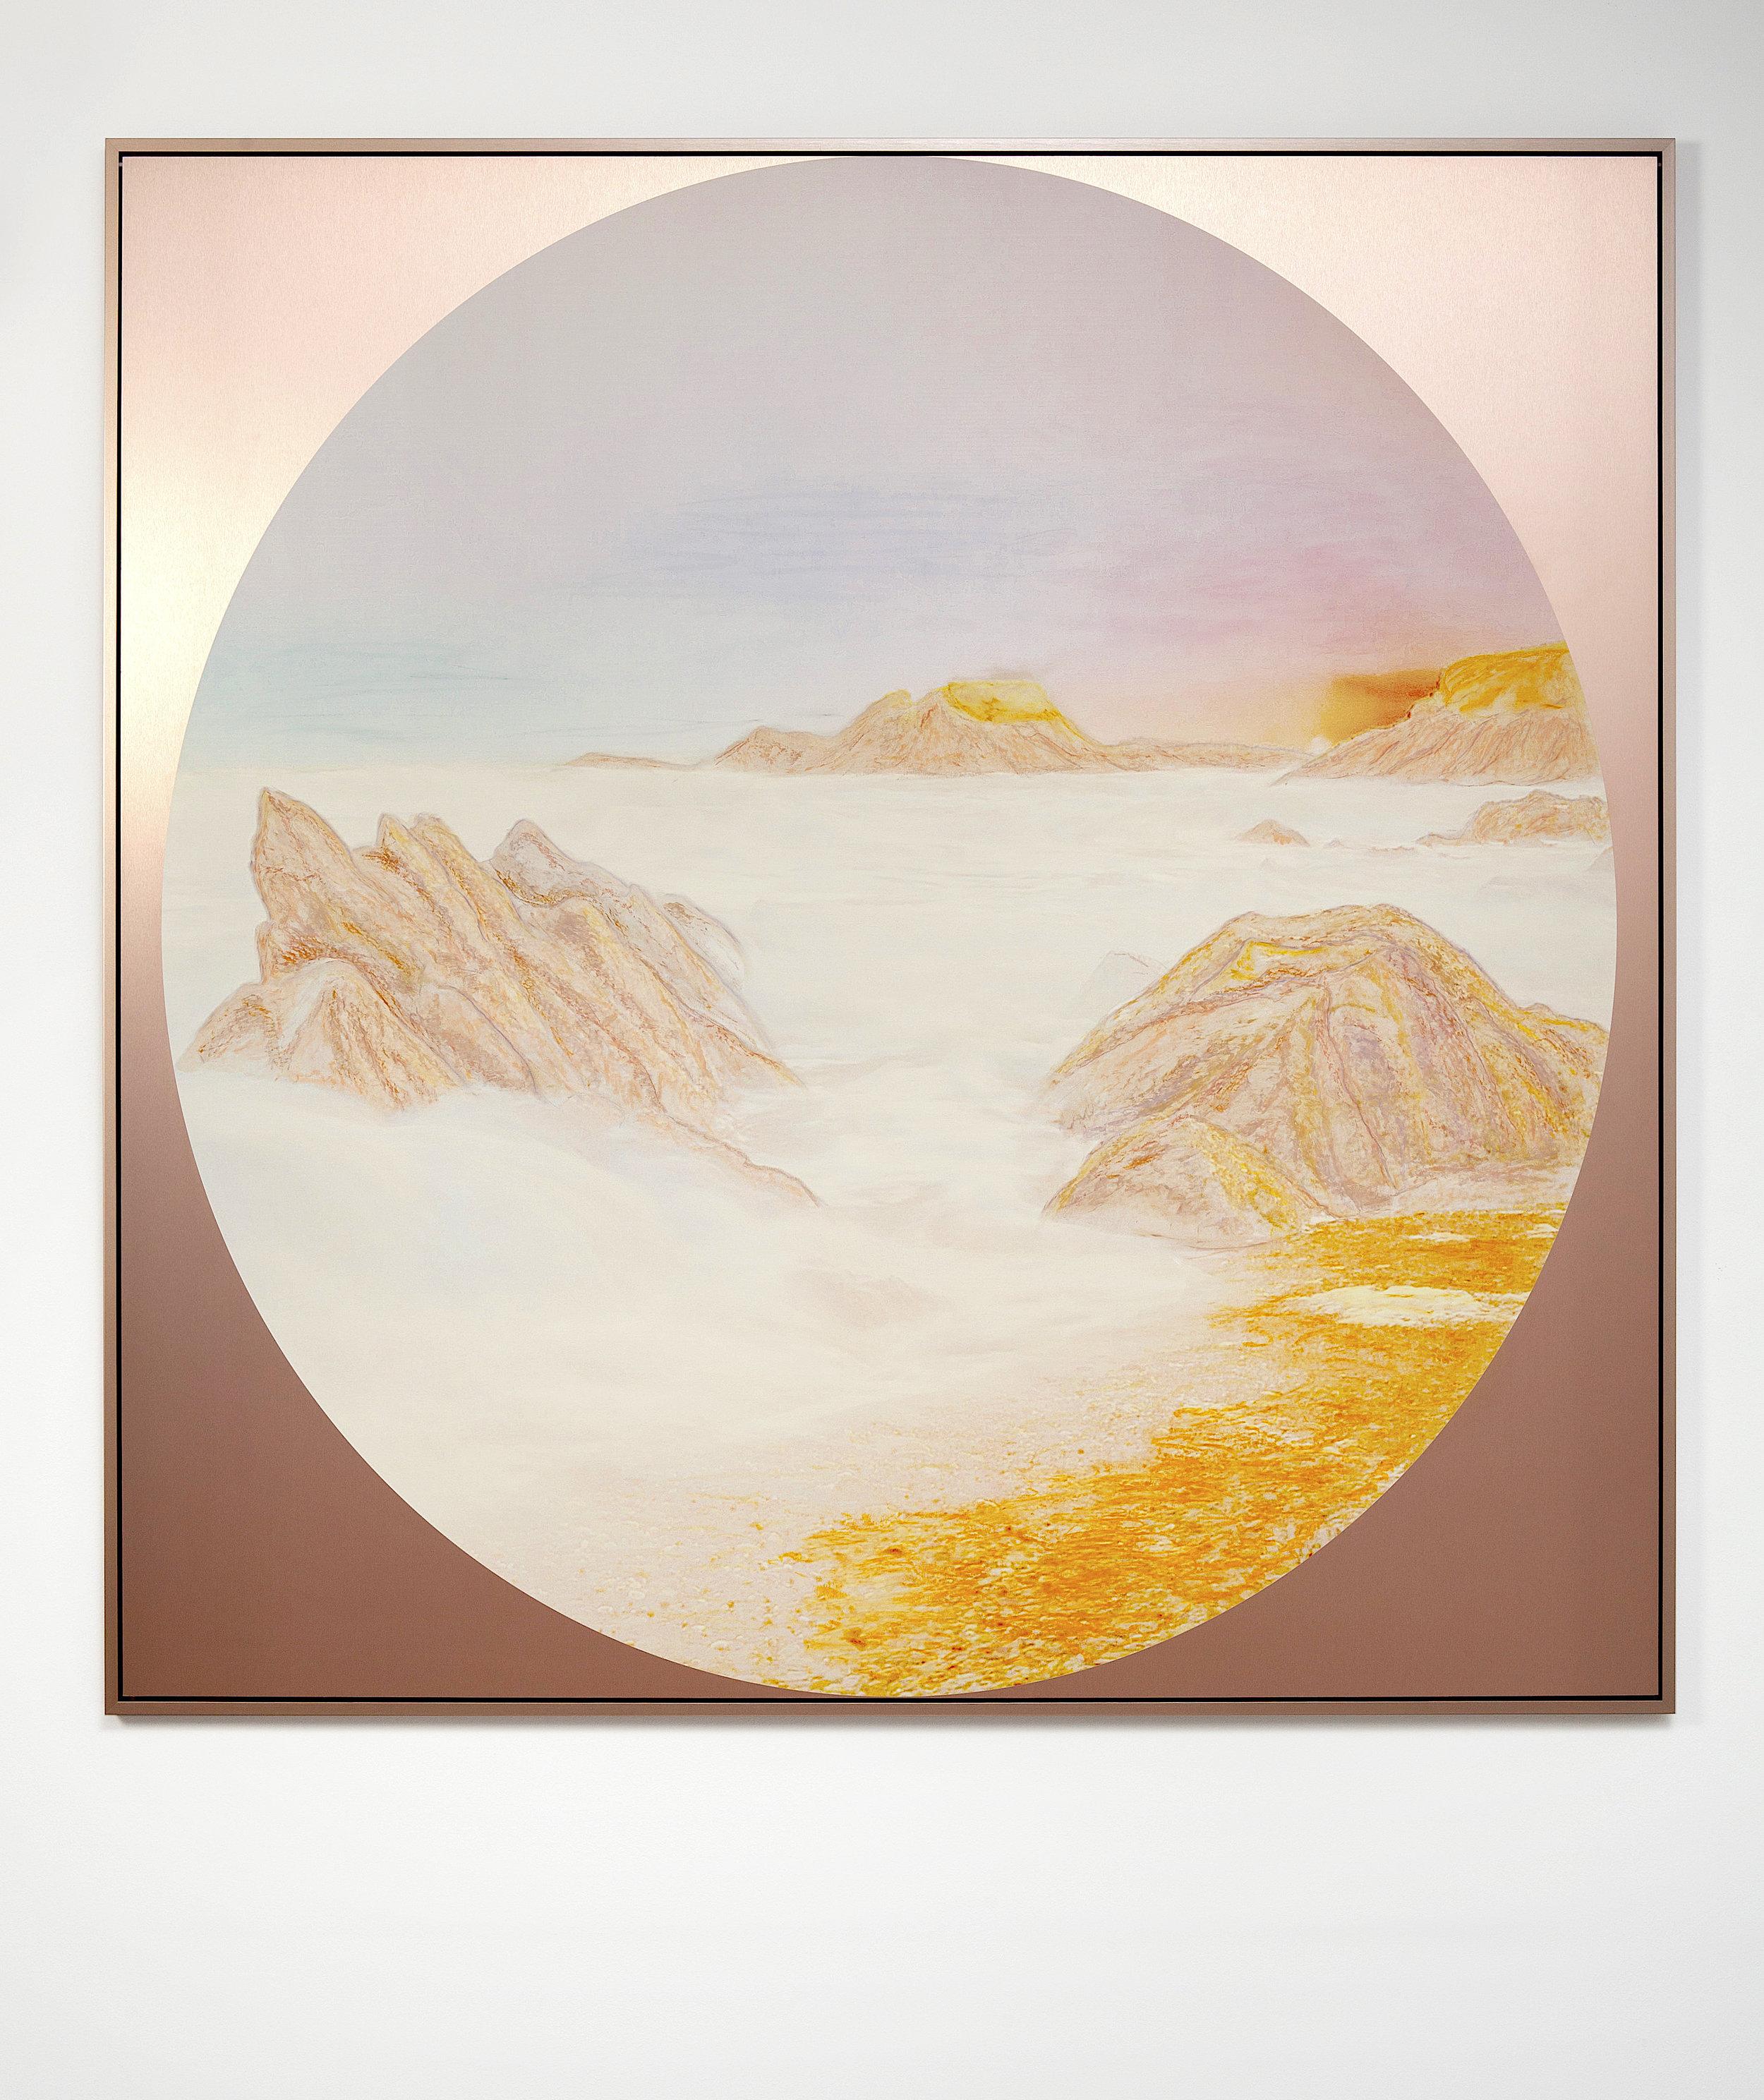 Beyond the Oecumene / Part XXXVIII,  2019 Wax pastels, UV-print on copper Alu-Dibond 150 x 150 cm (59 x 59 in)